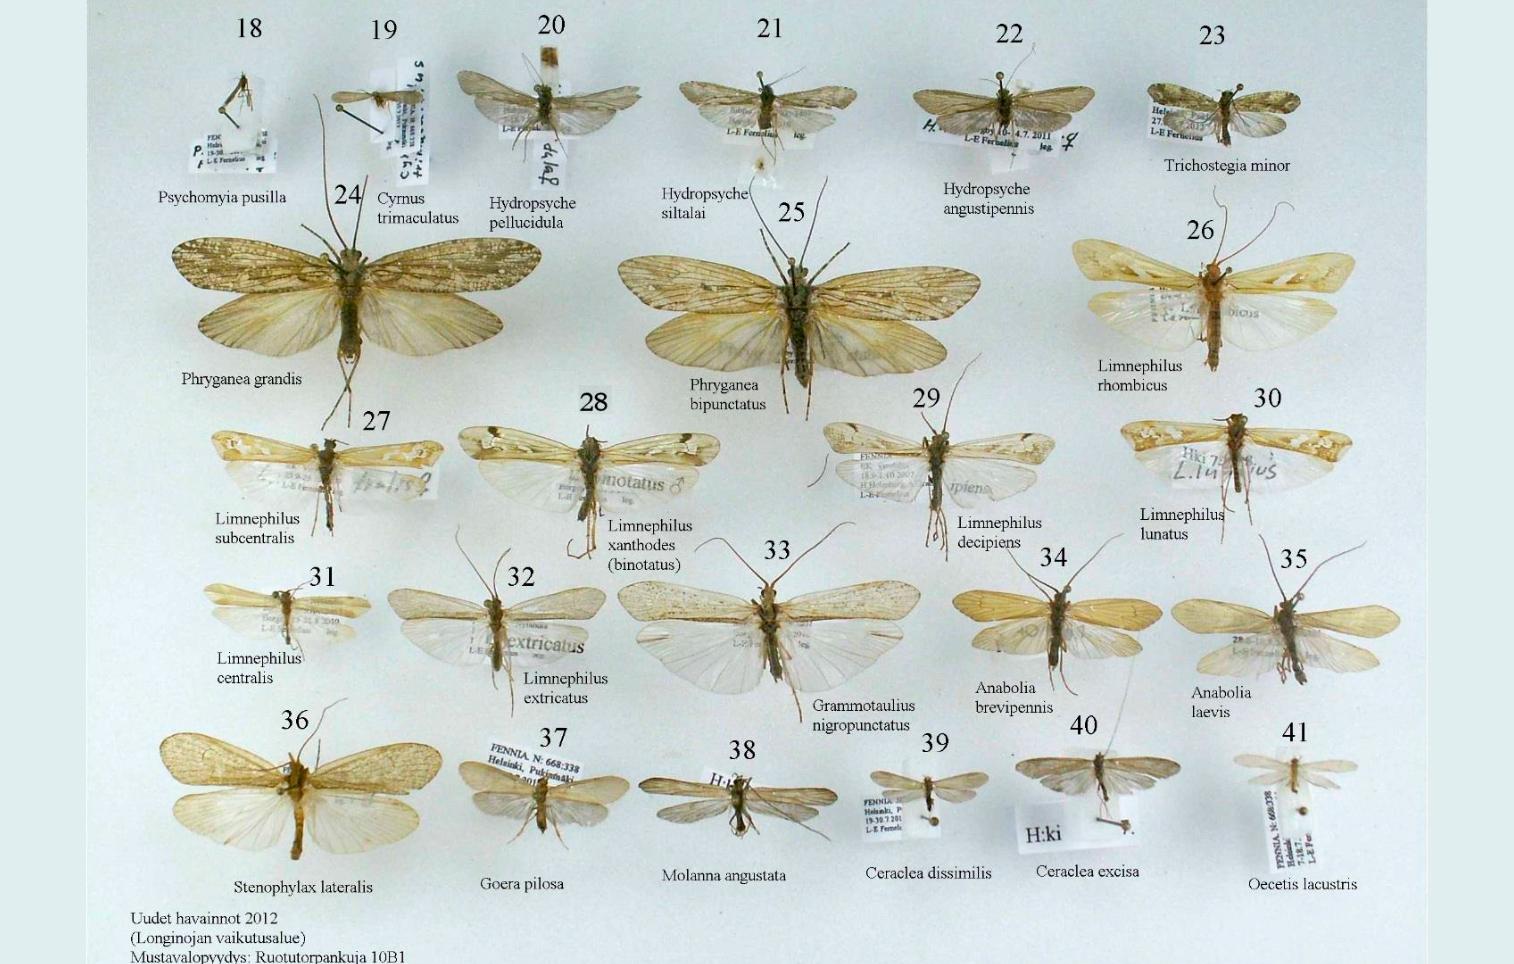 longinoja-vesiperhonen-lars-erik-farnelius2